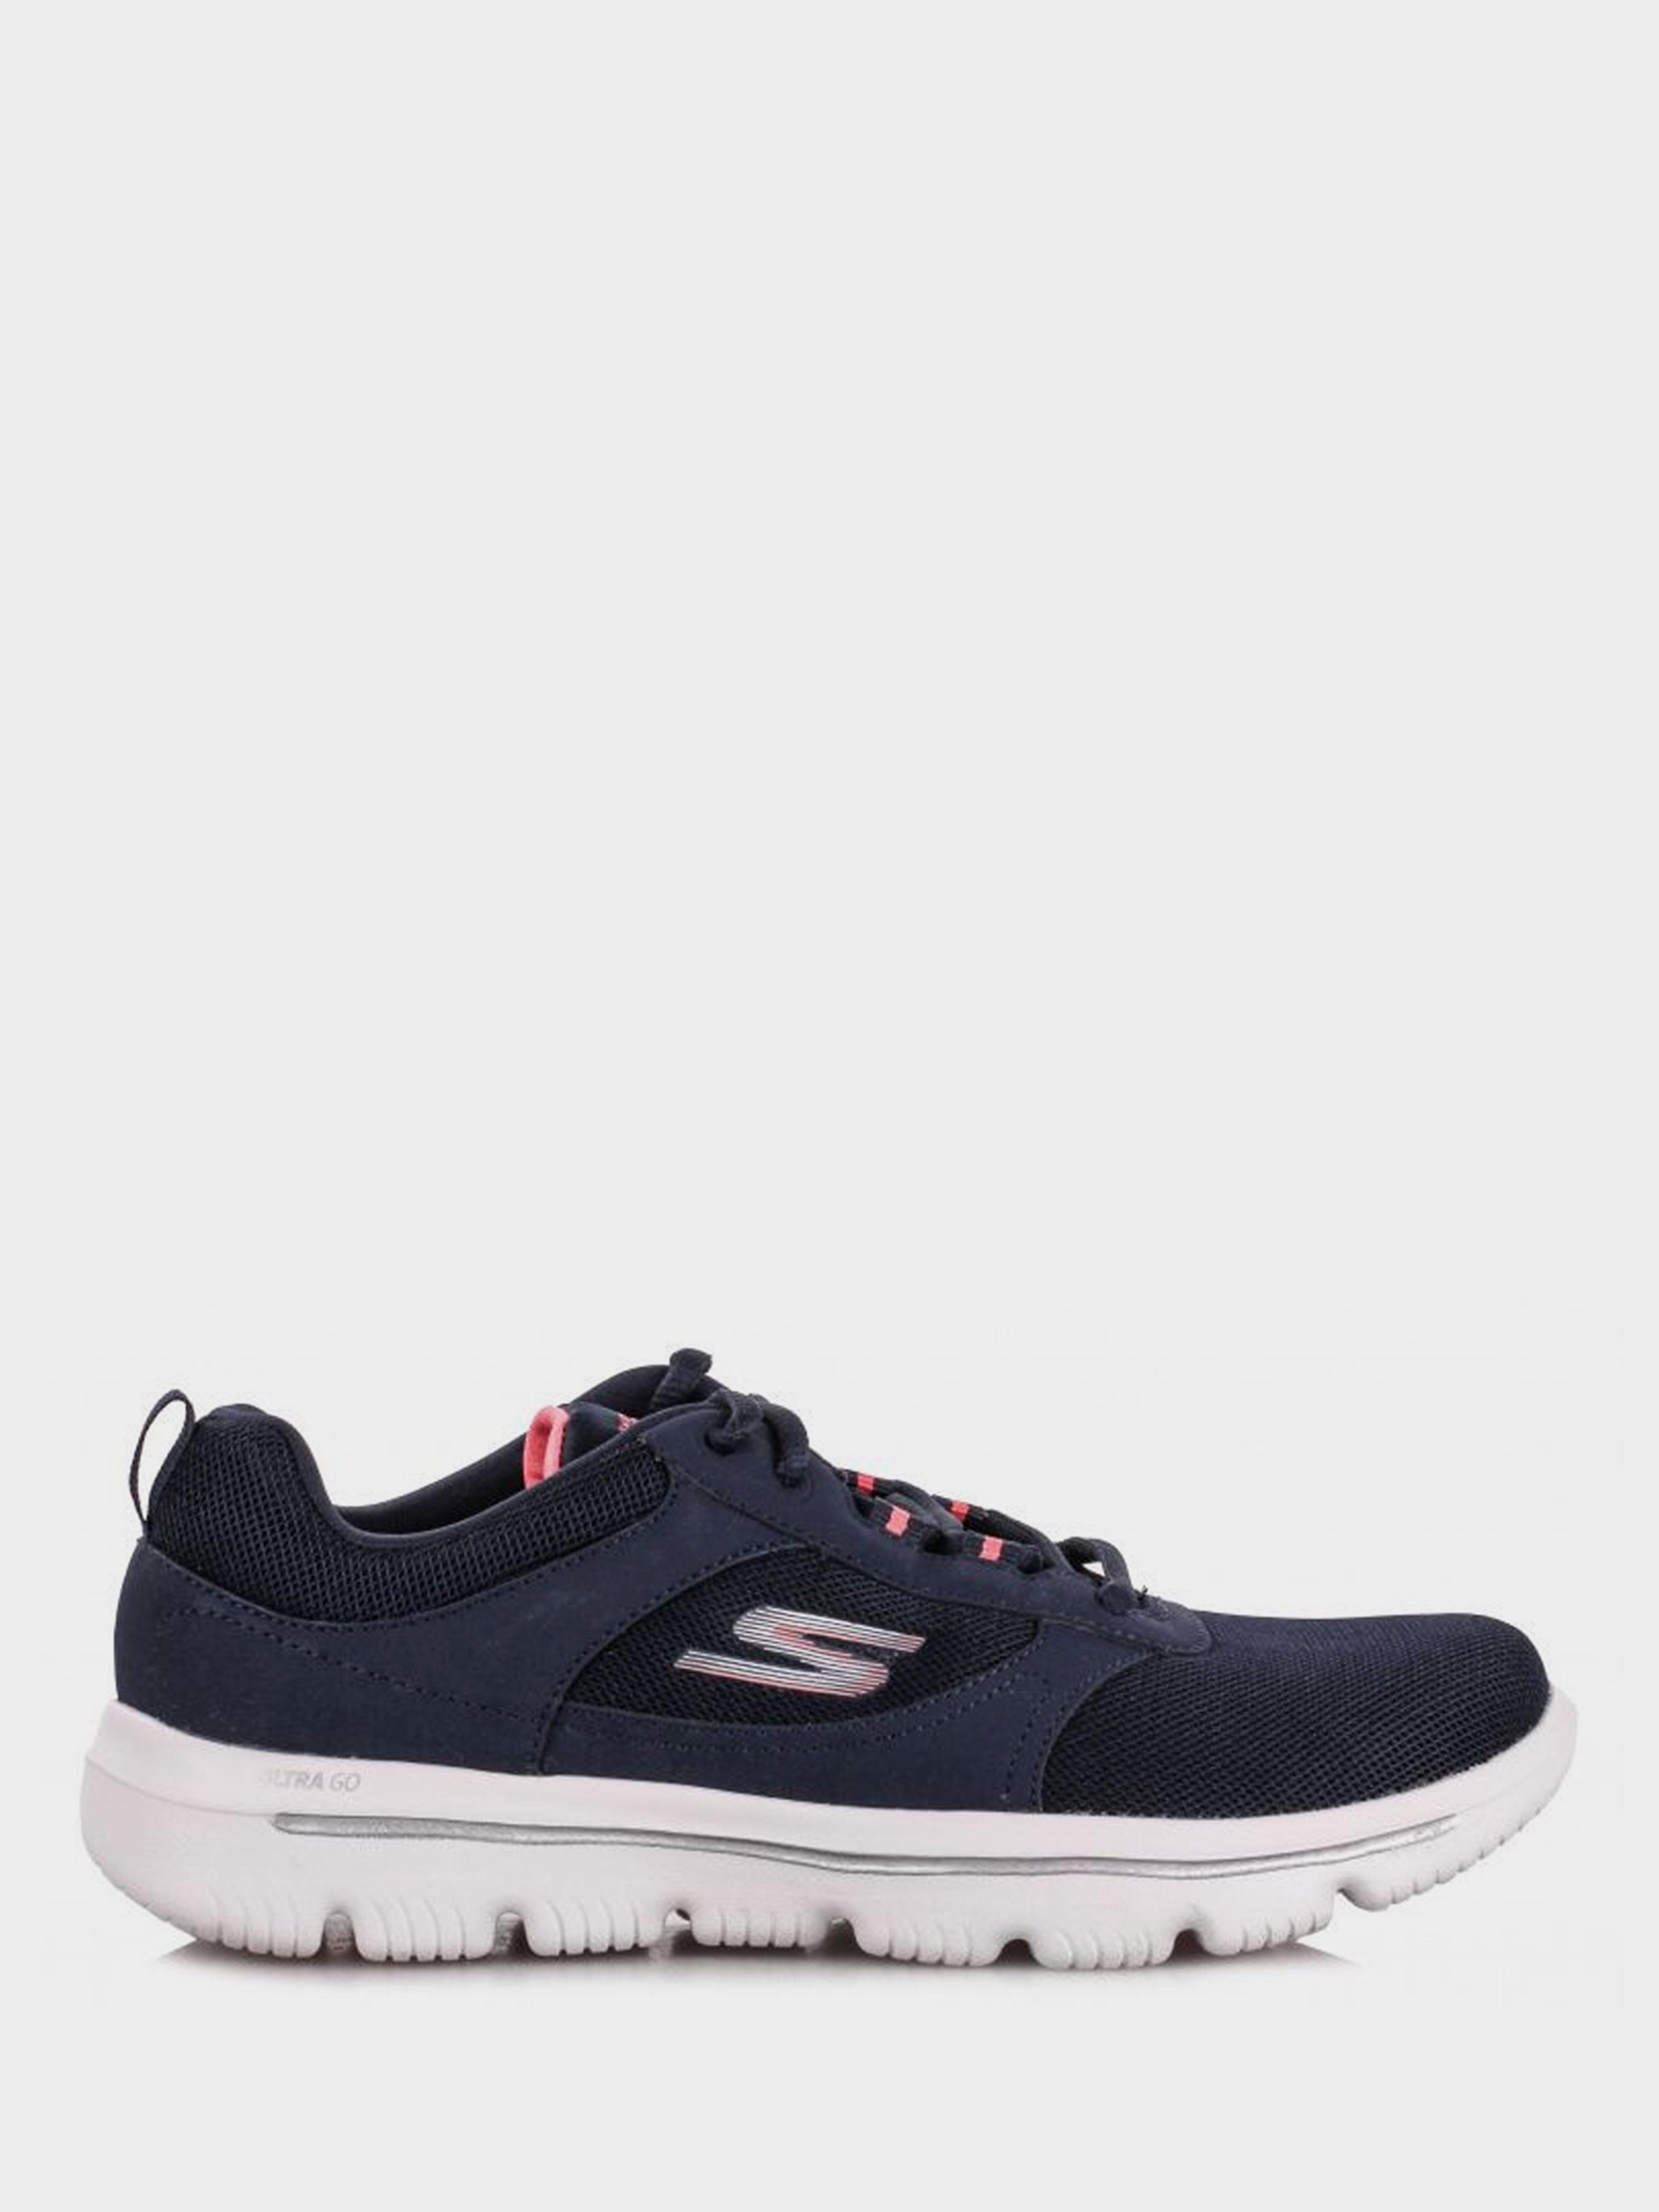 Кроссовки для женщин Skechers KW4794 продажа, 2017